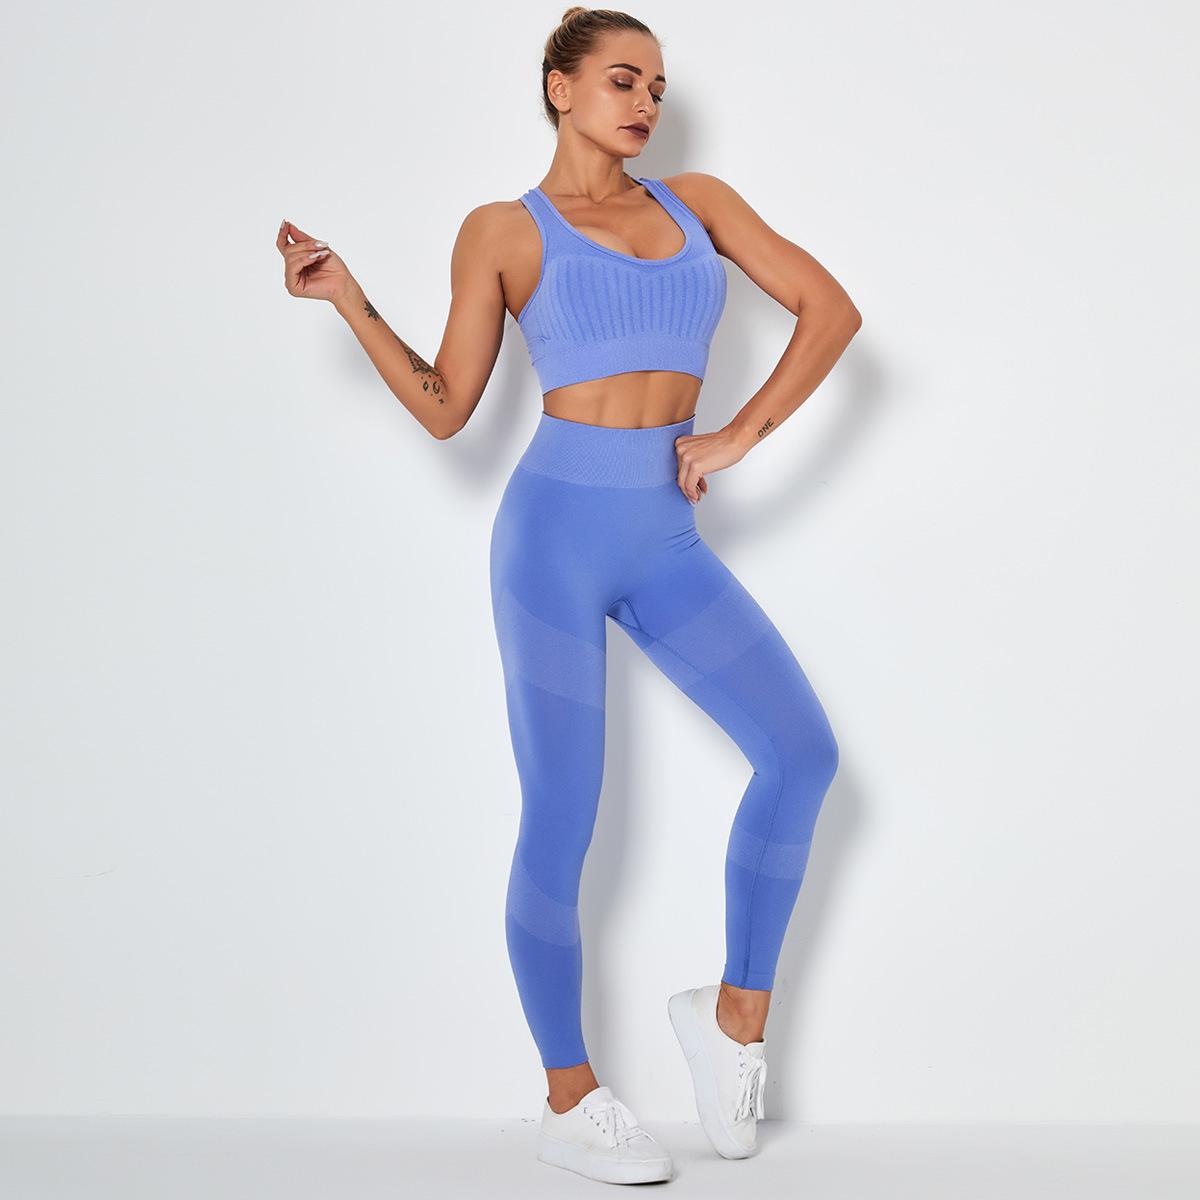 Leggings and Tops Sportswear Set